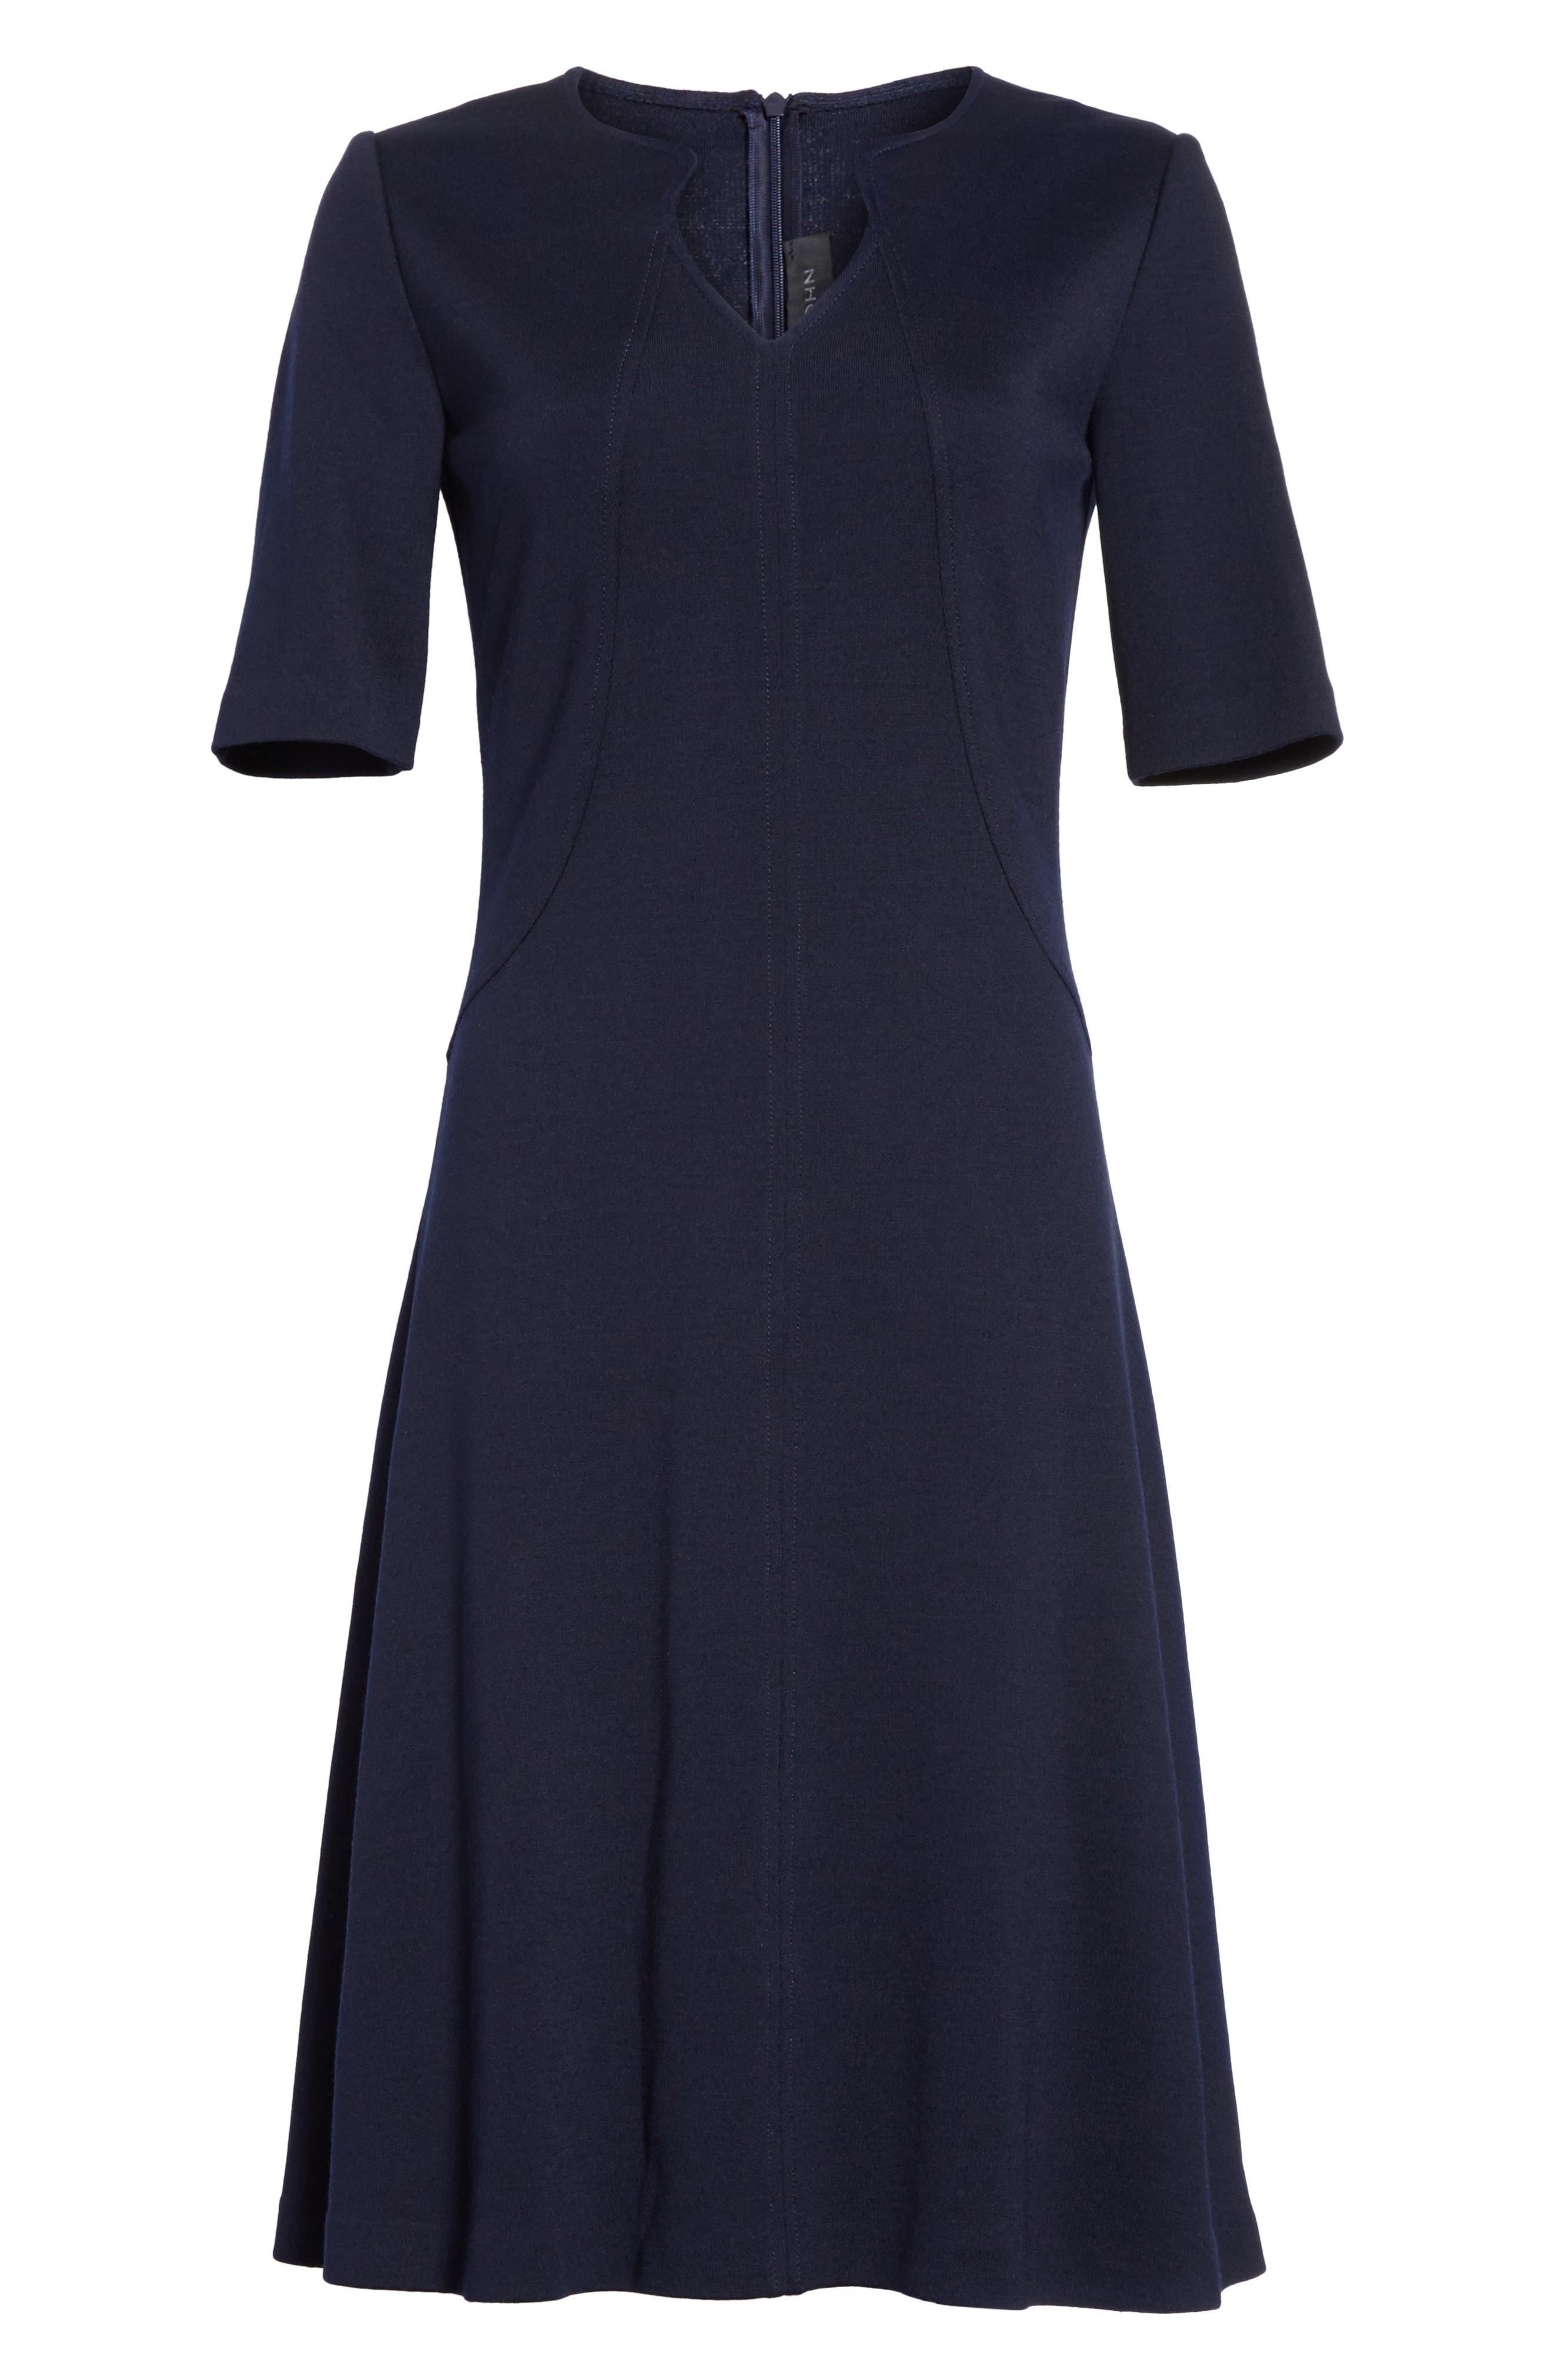 Milano Knit A-Line Dress,                             Alternate thumbnail 7, color,                             Navy